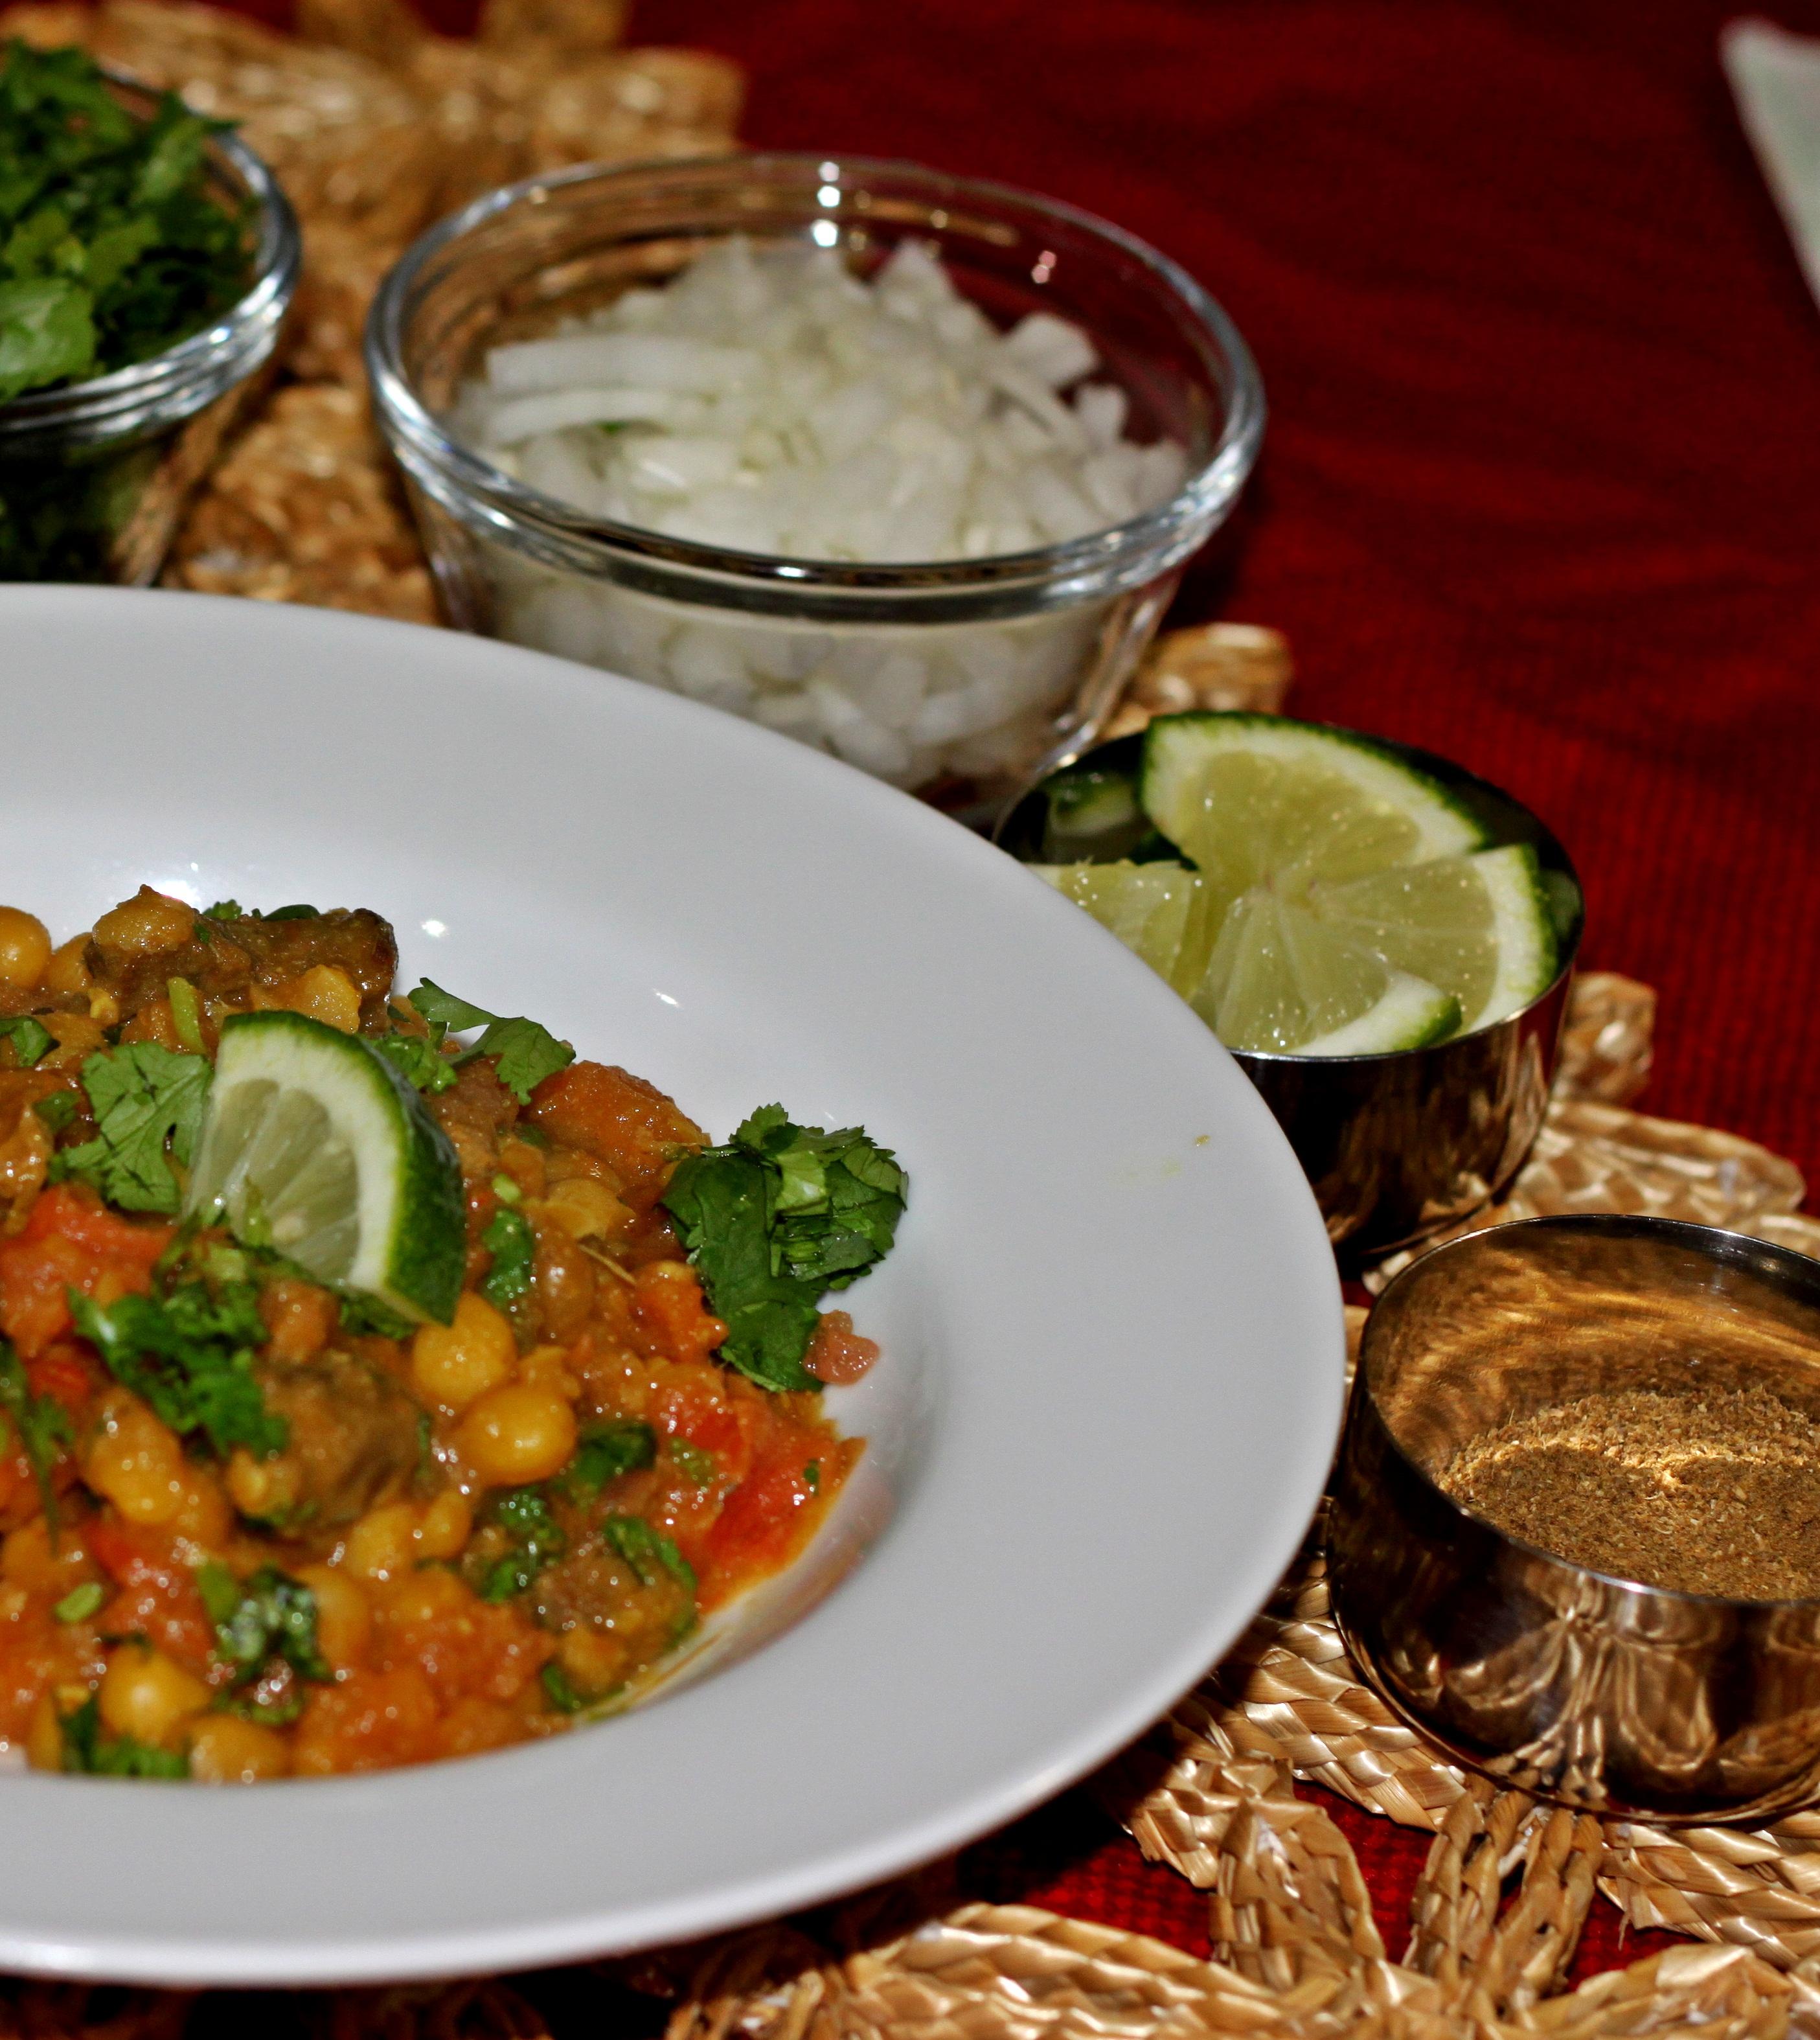 Slow Cooked Bengali Lamb Chili